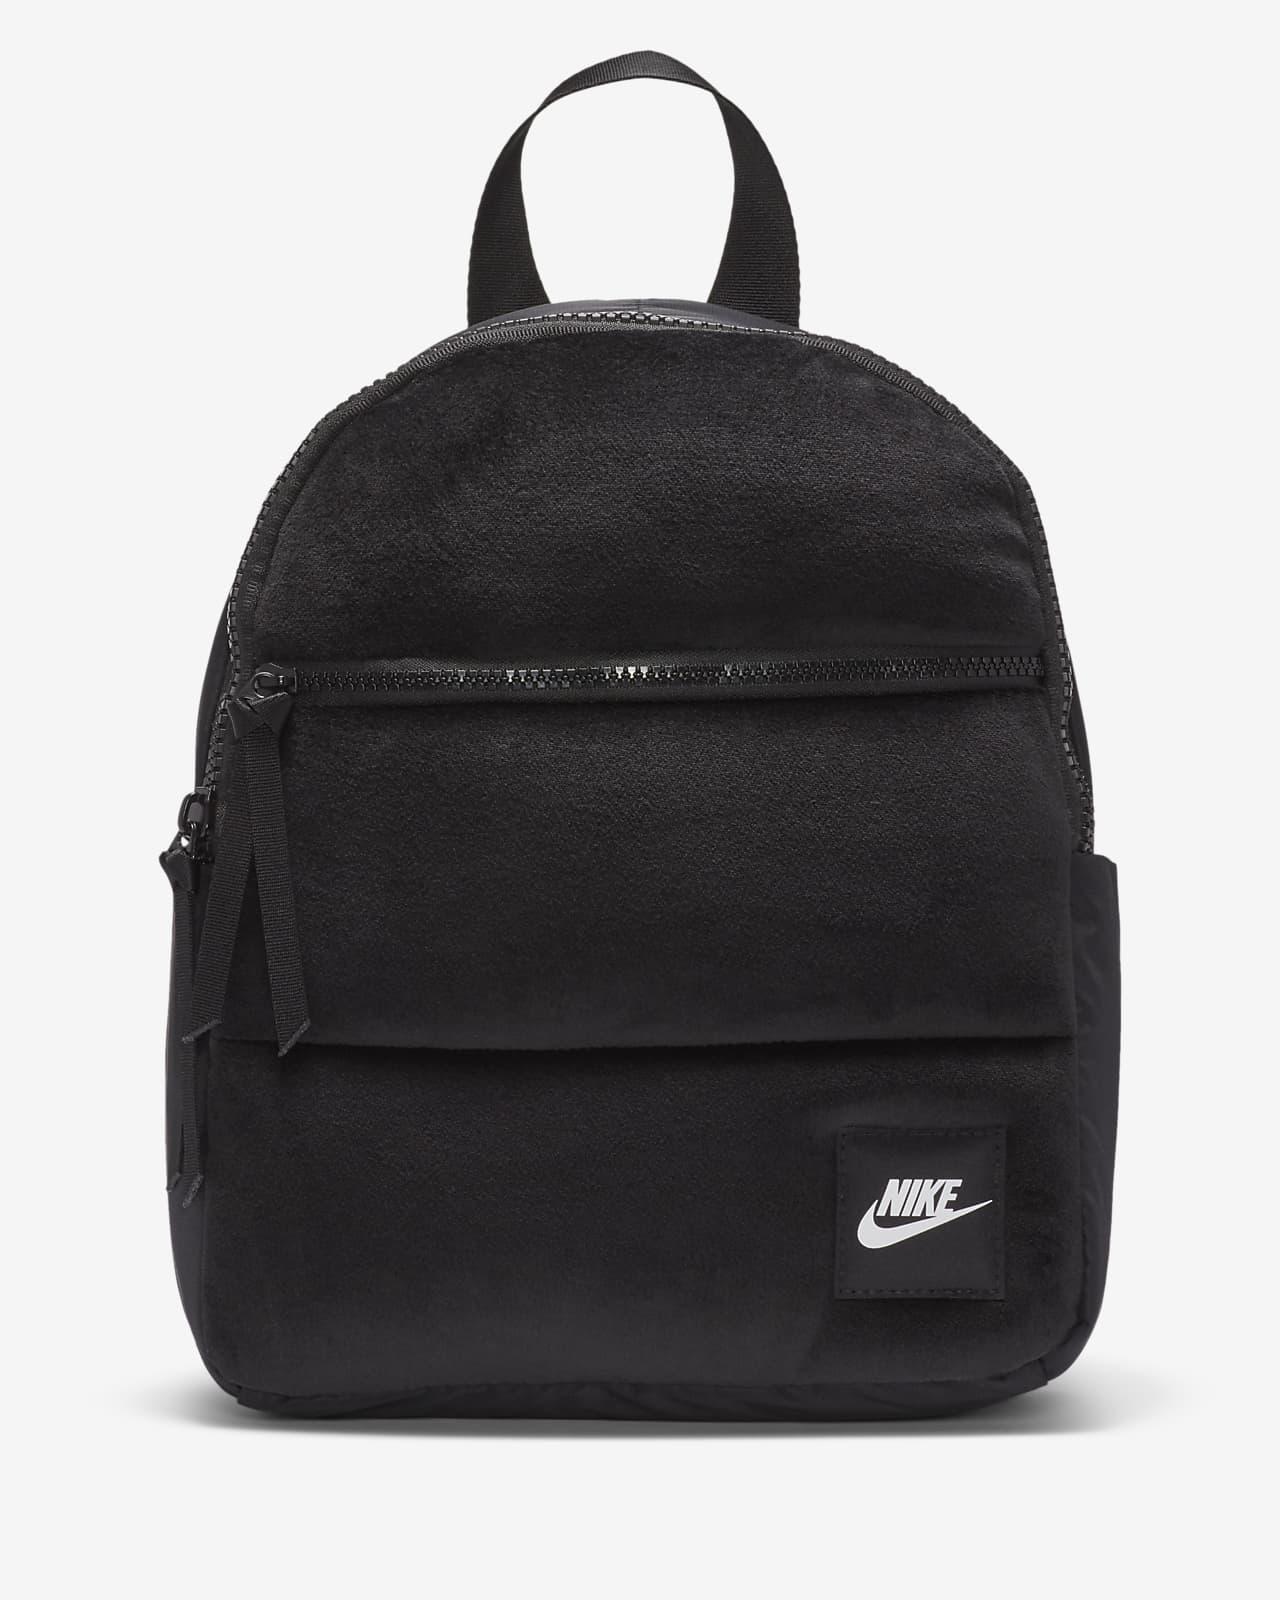 Mini batoh Nike Sportswear Essentials do chladného počasí